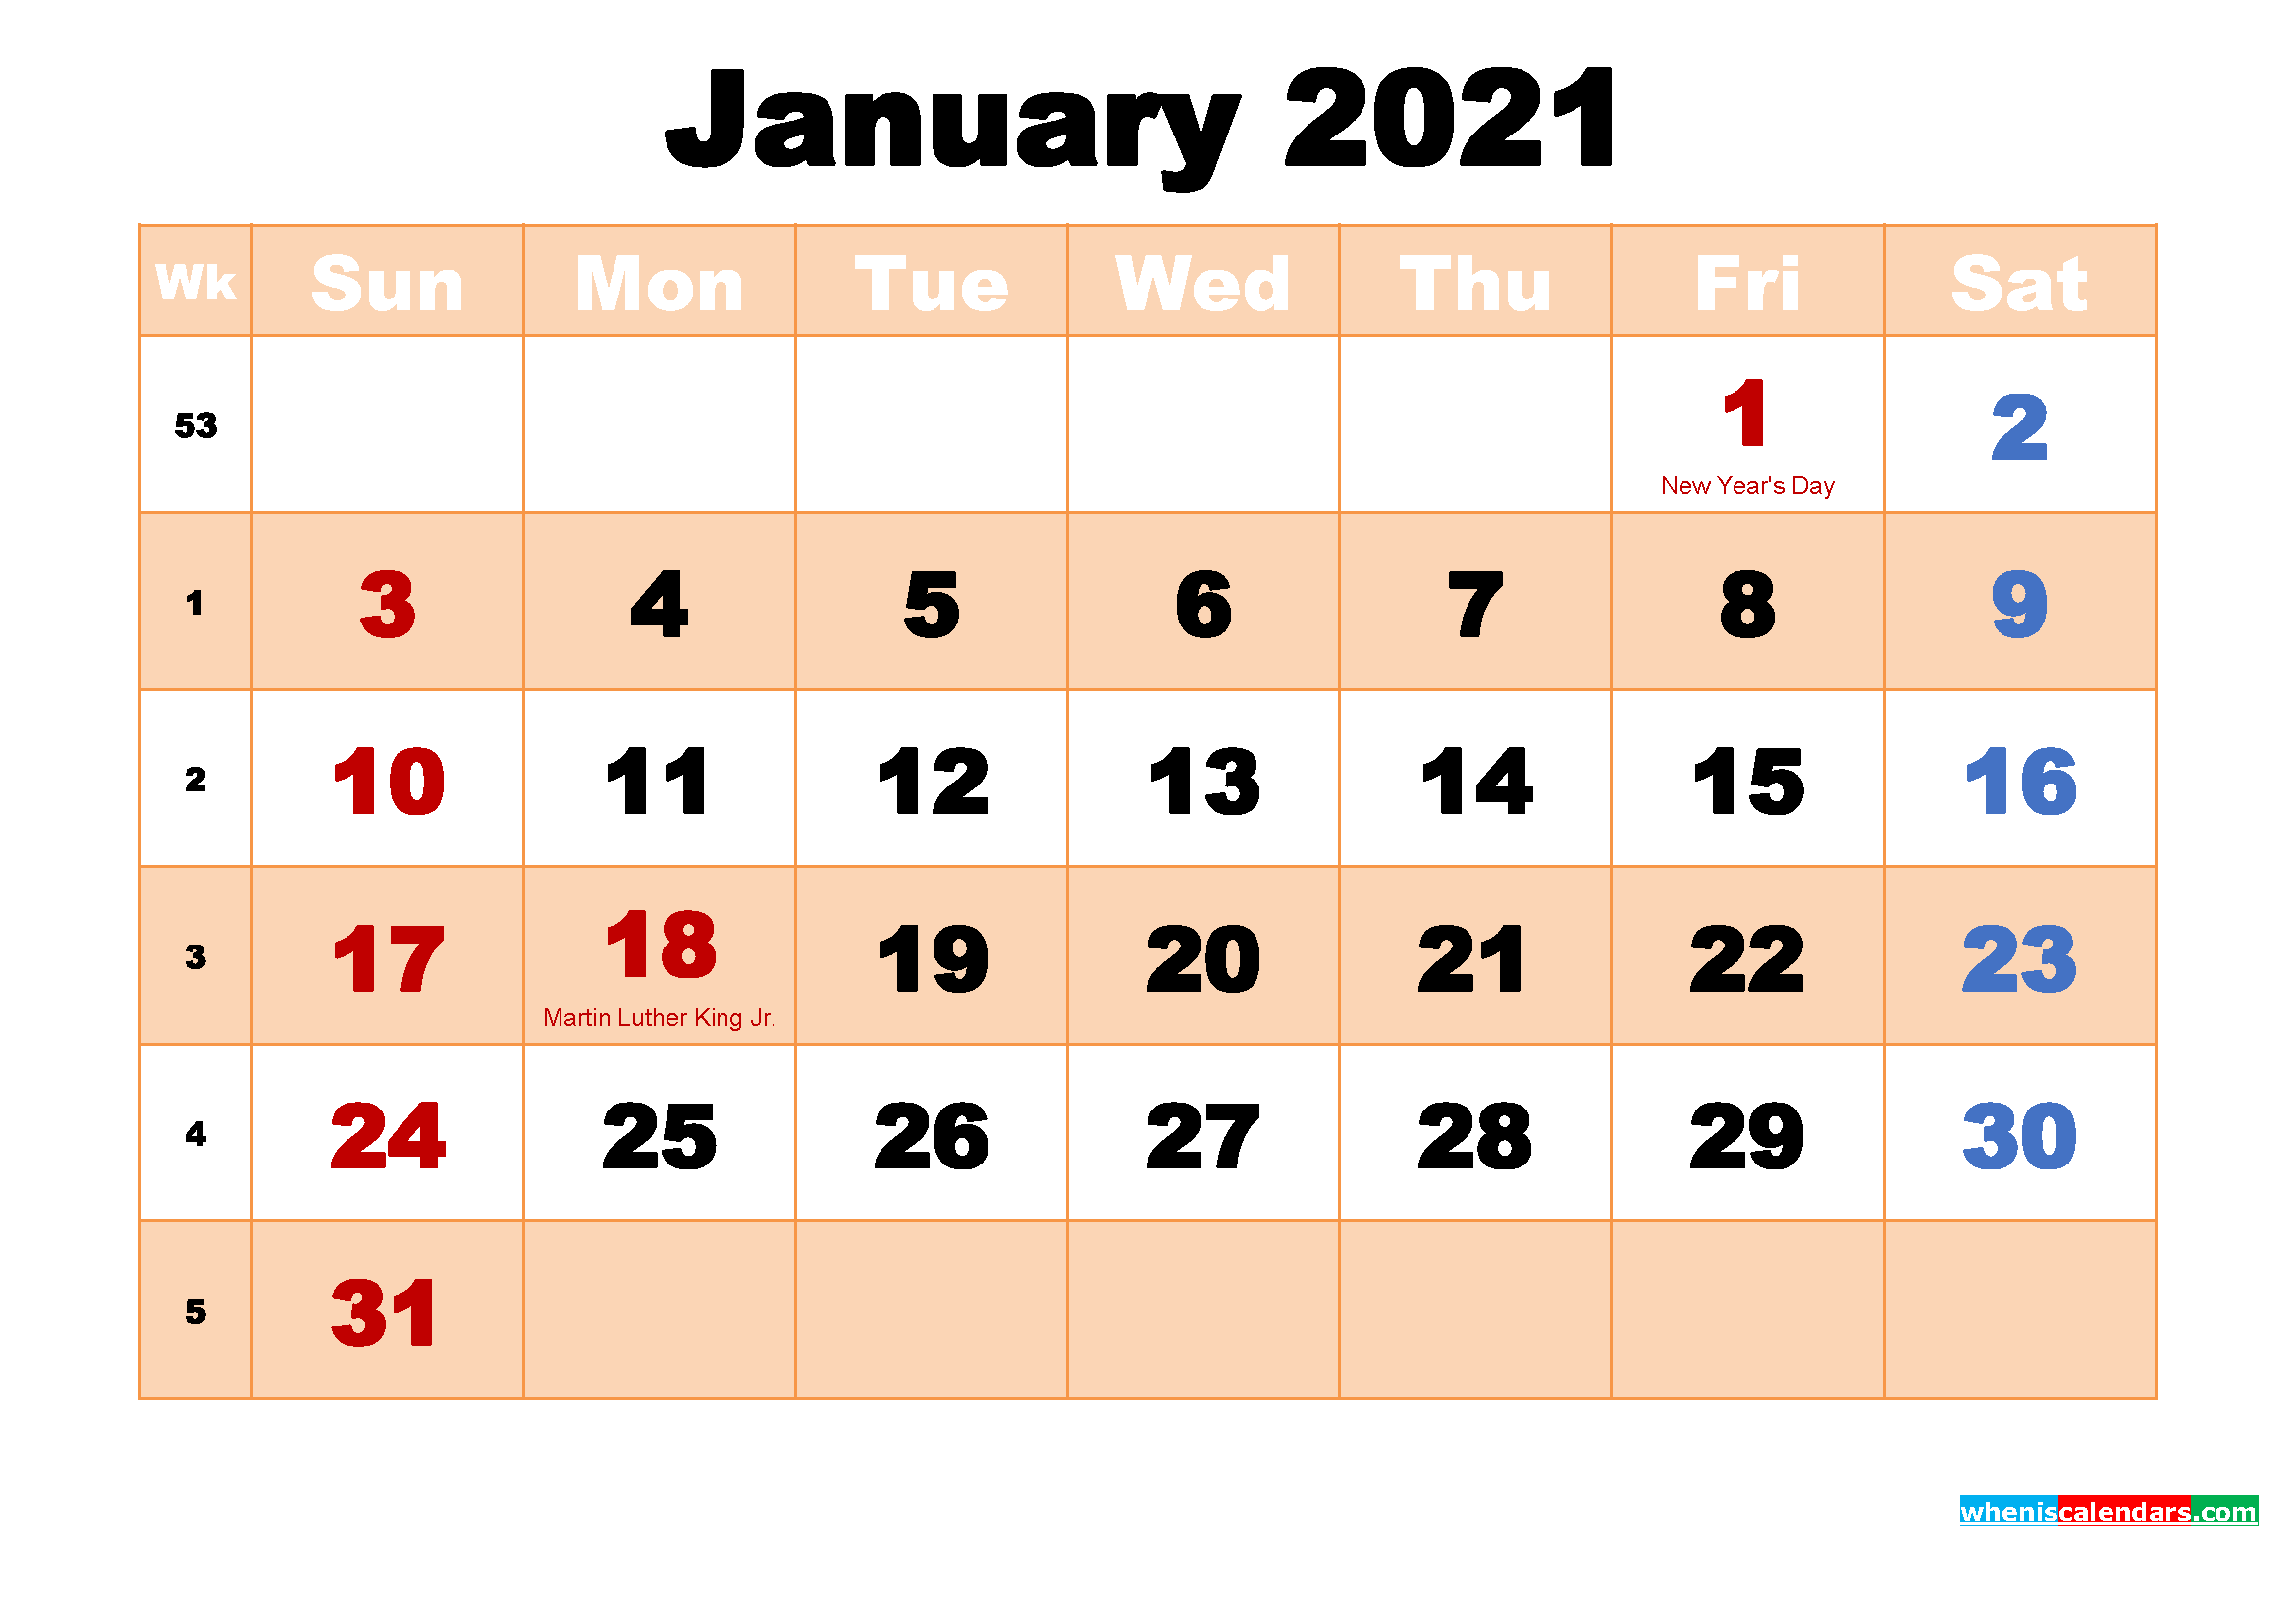 January 2021 Printable Calendar with Holidays